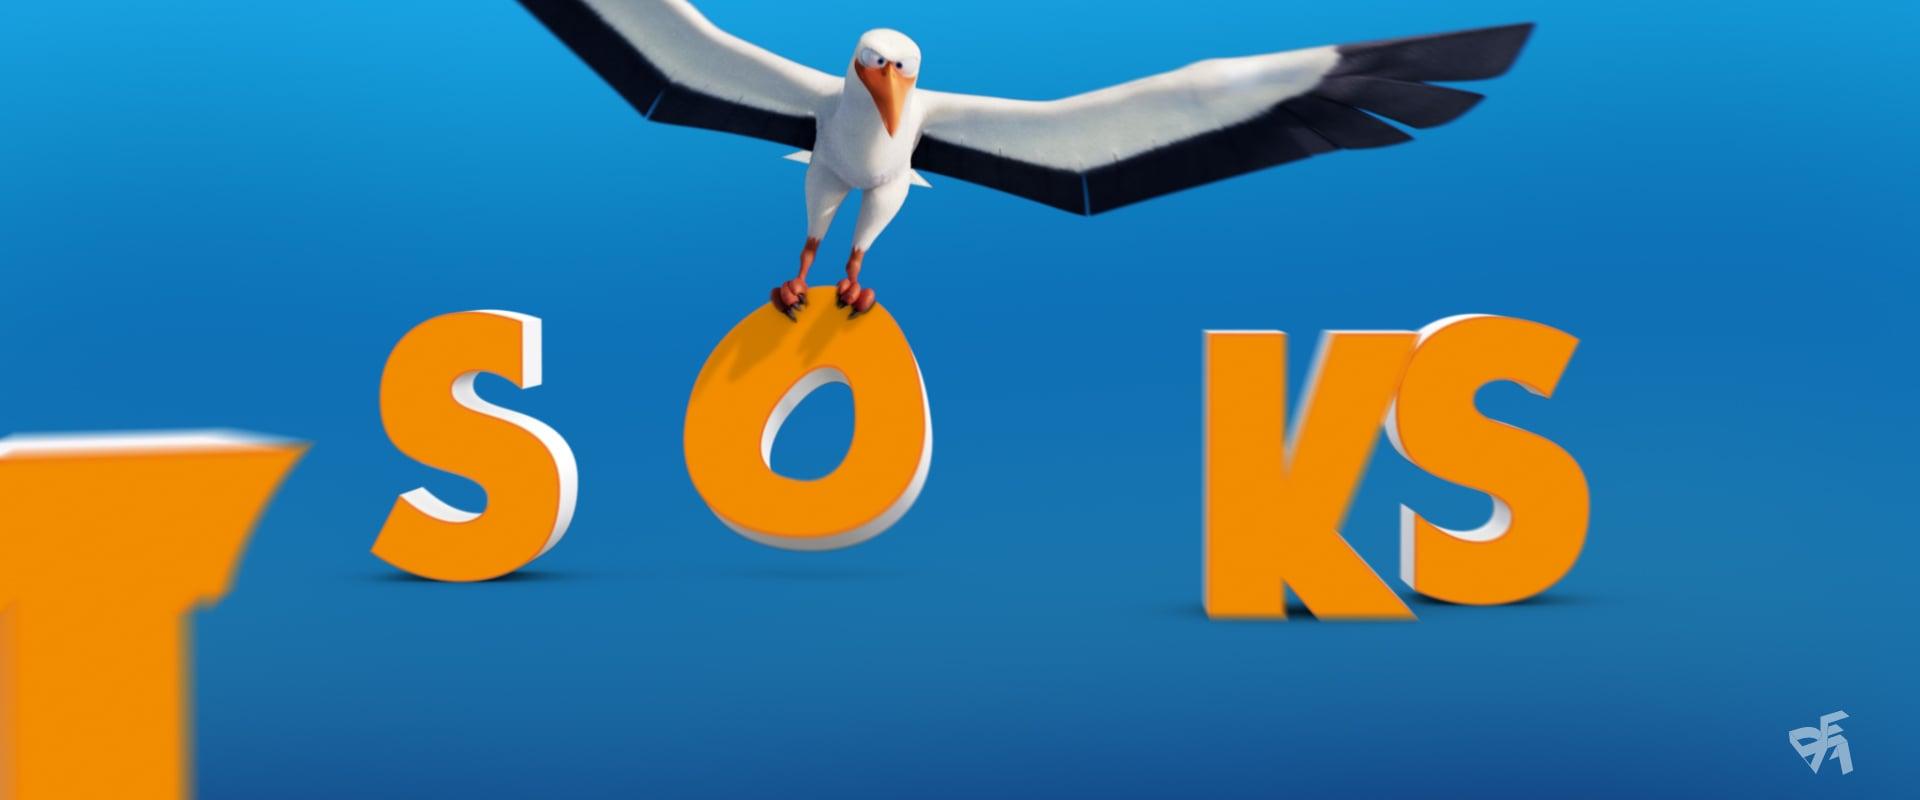 Storks-TRAILERSTILL-devaGFX_04.jpg